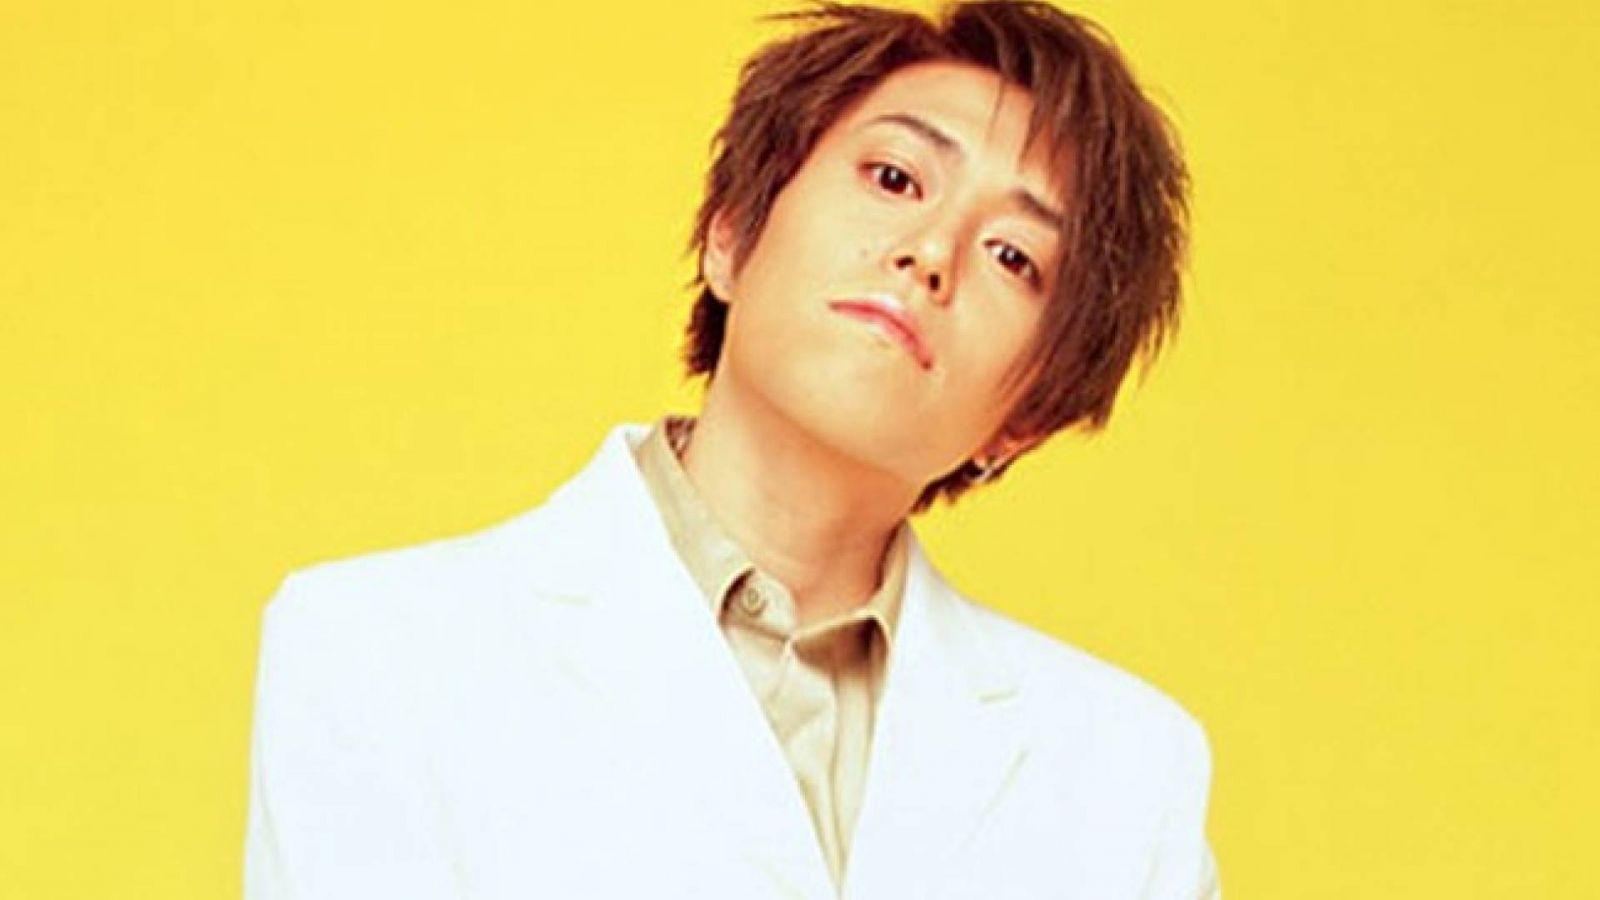 Kotani Kinya. © Sony Music Entertainment (Japan) Inc.